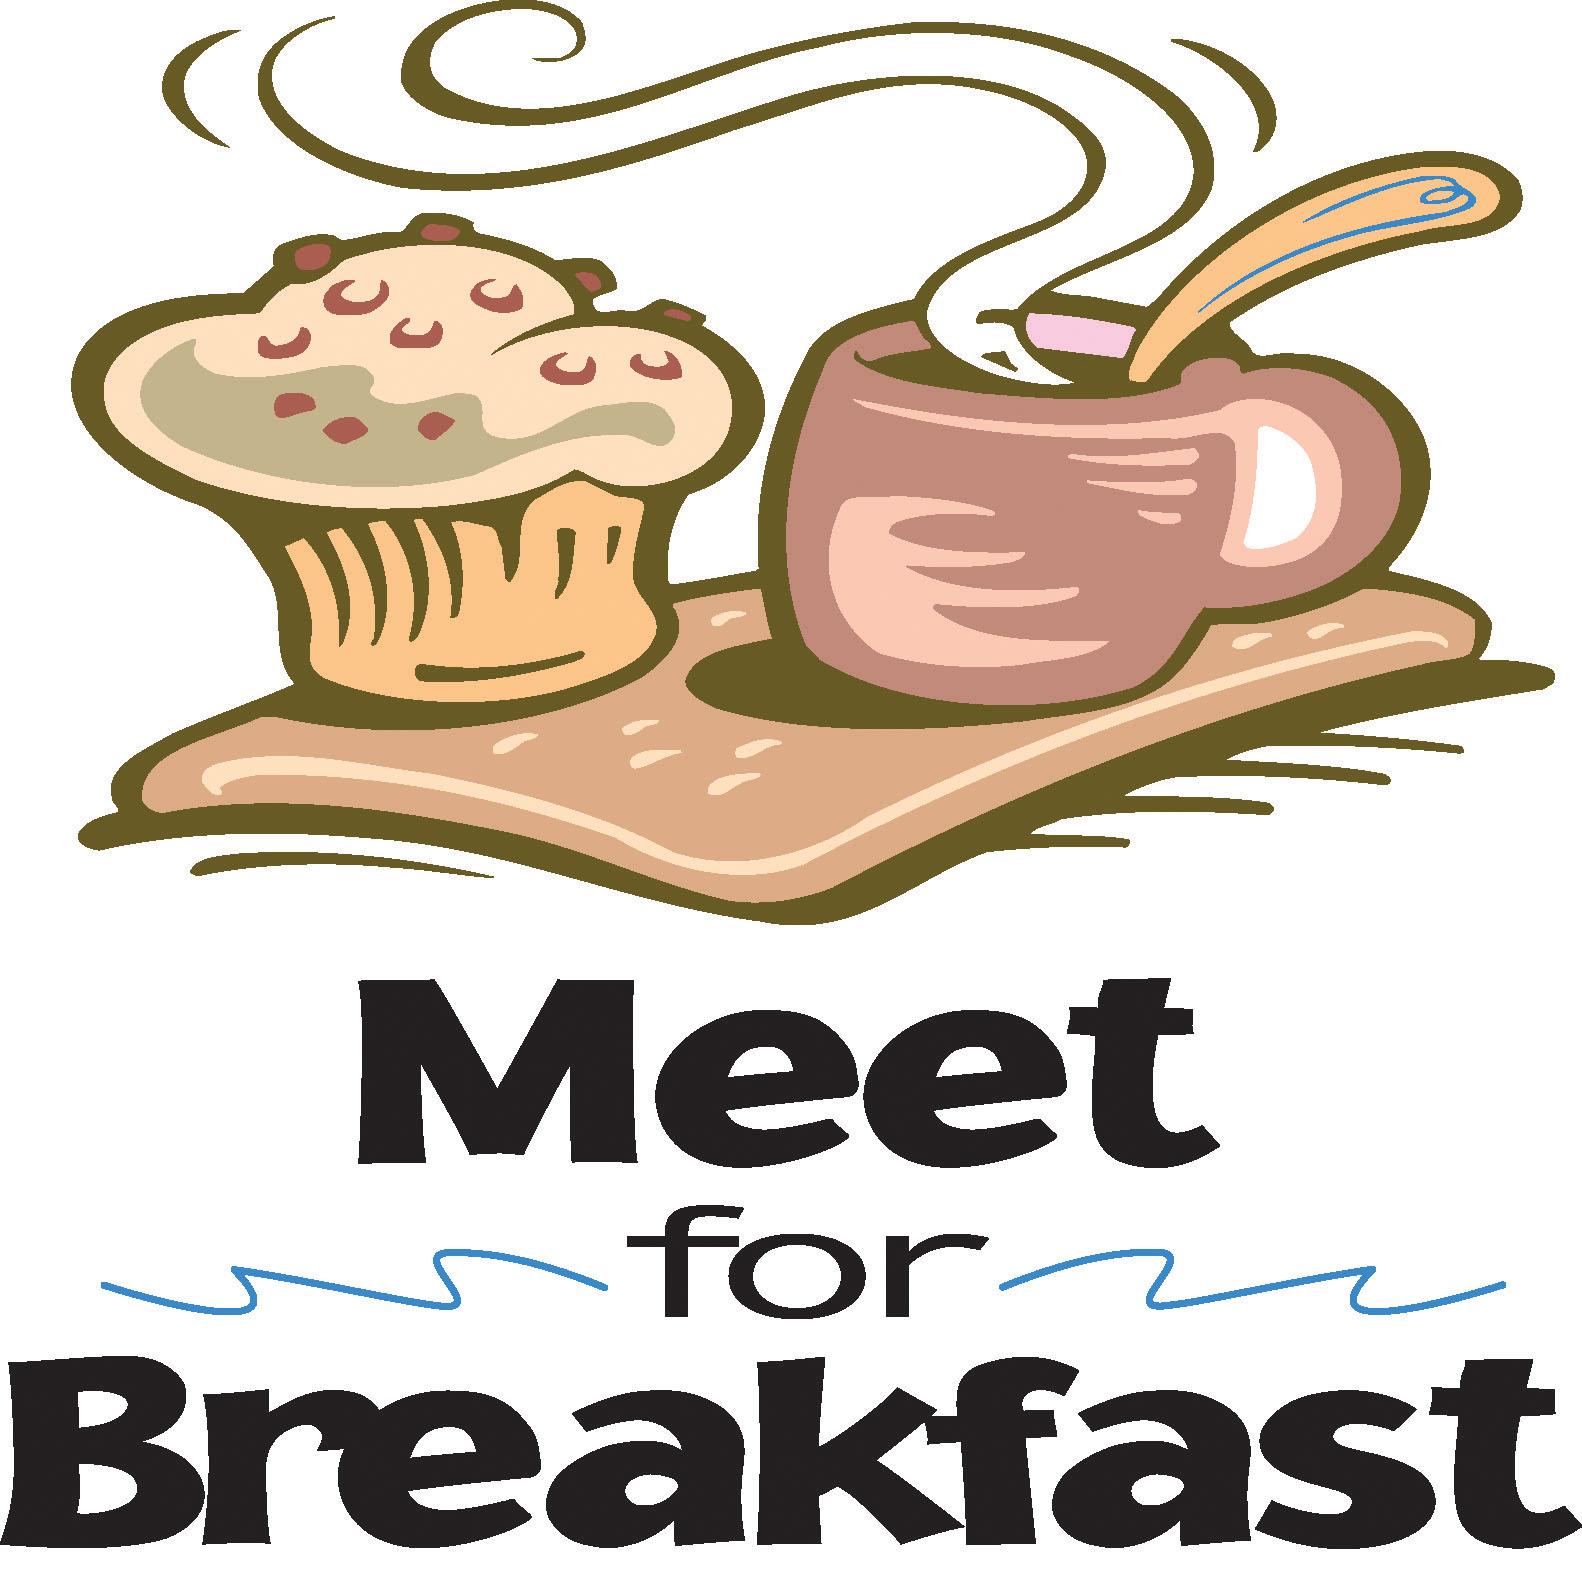 breakfast meeting clipart